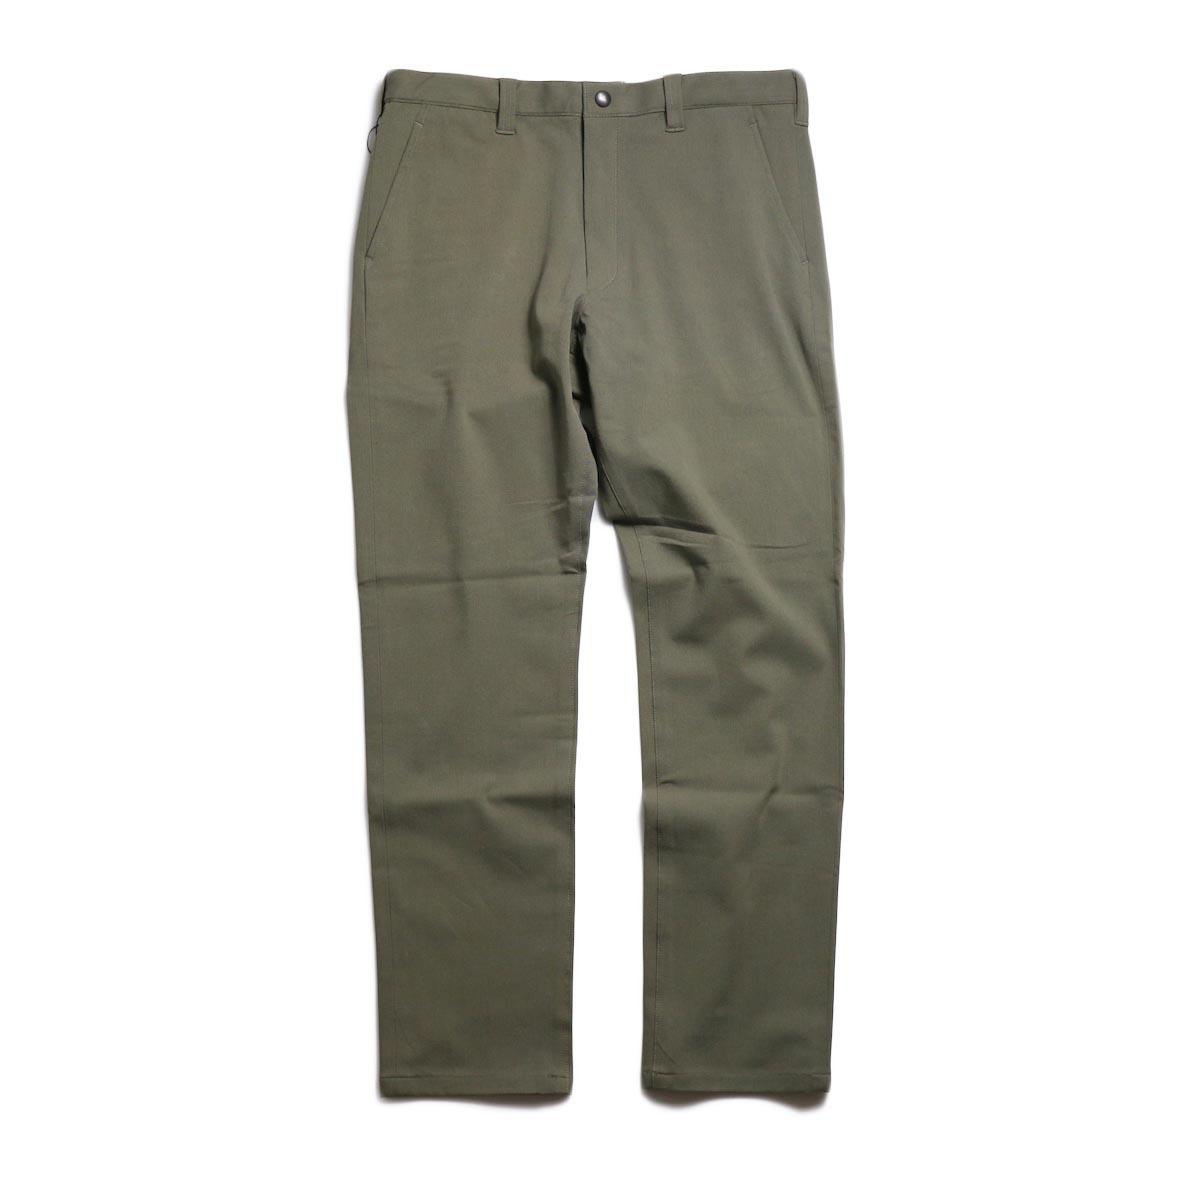 N.HOOLYWOOD / 291-CP04-018-peg Stretch Chino Pant (Gray)